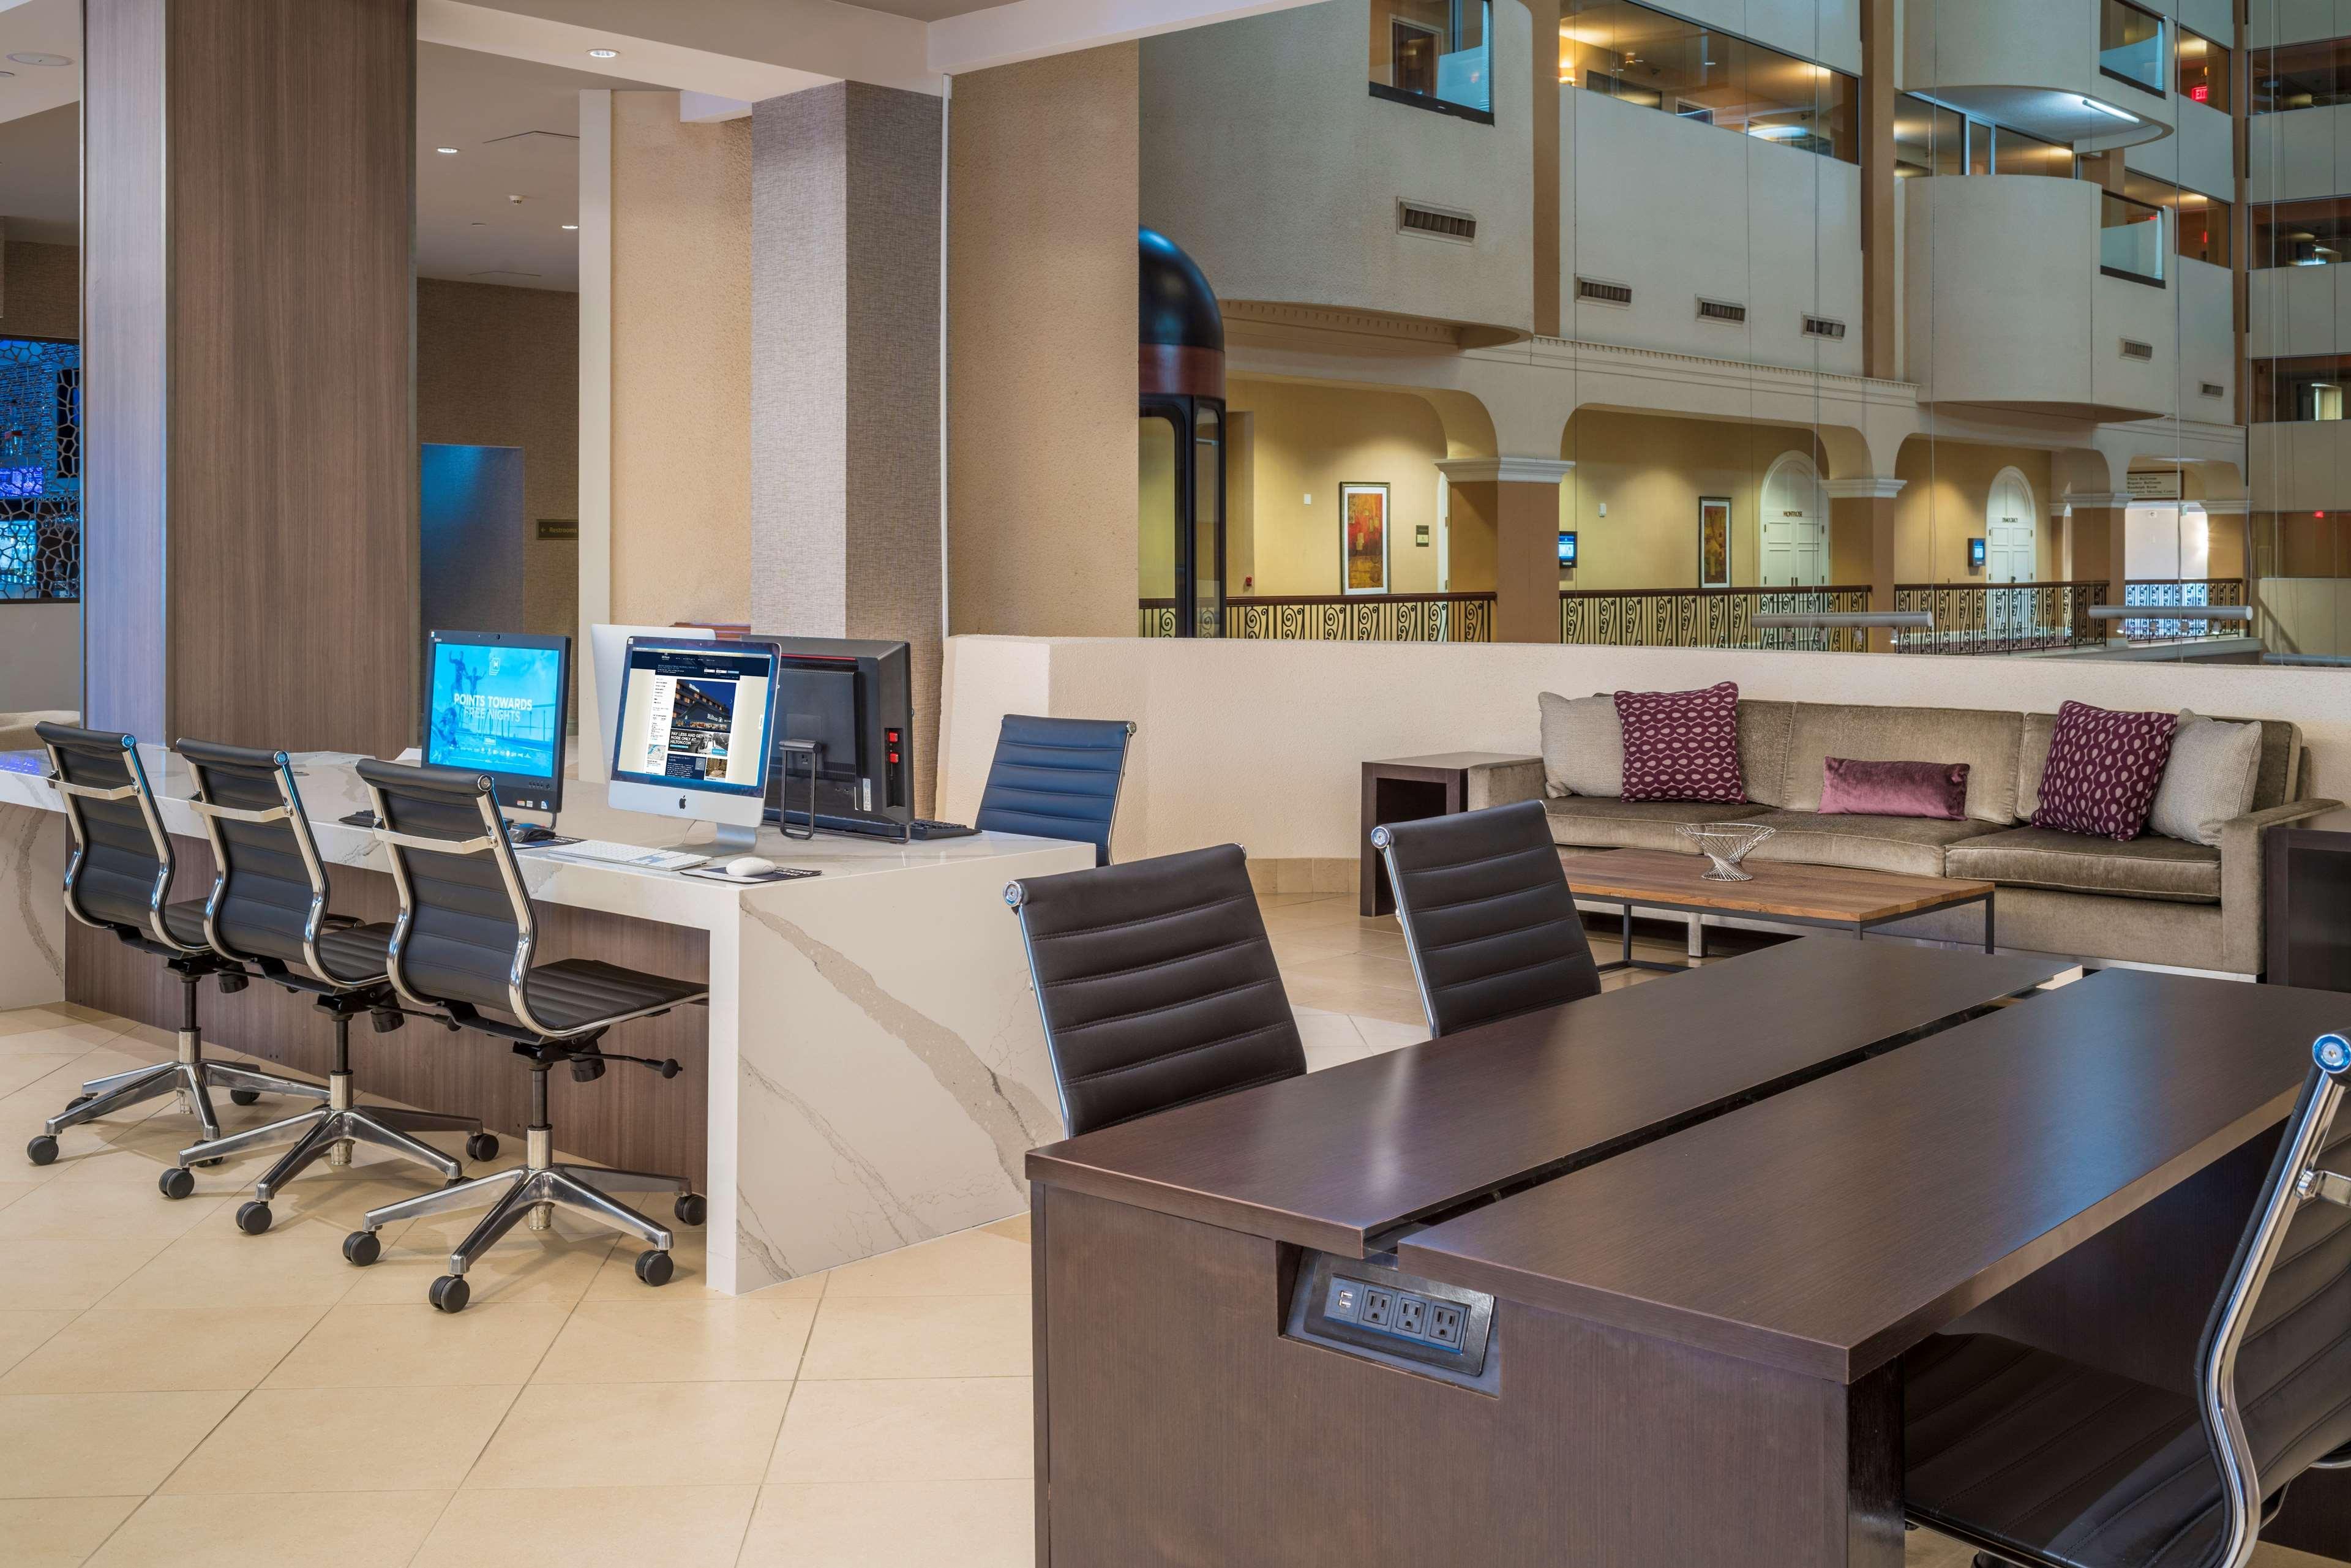 Hilton Washington DC/Rockville Hotel & Executive Meeting Ctr image 8